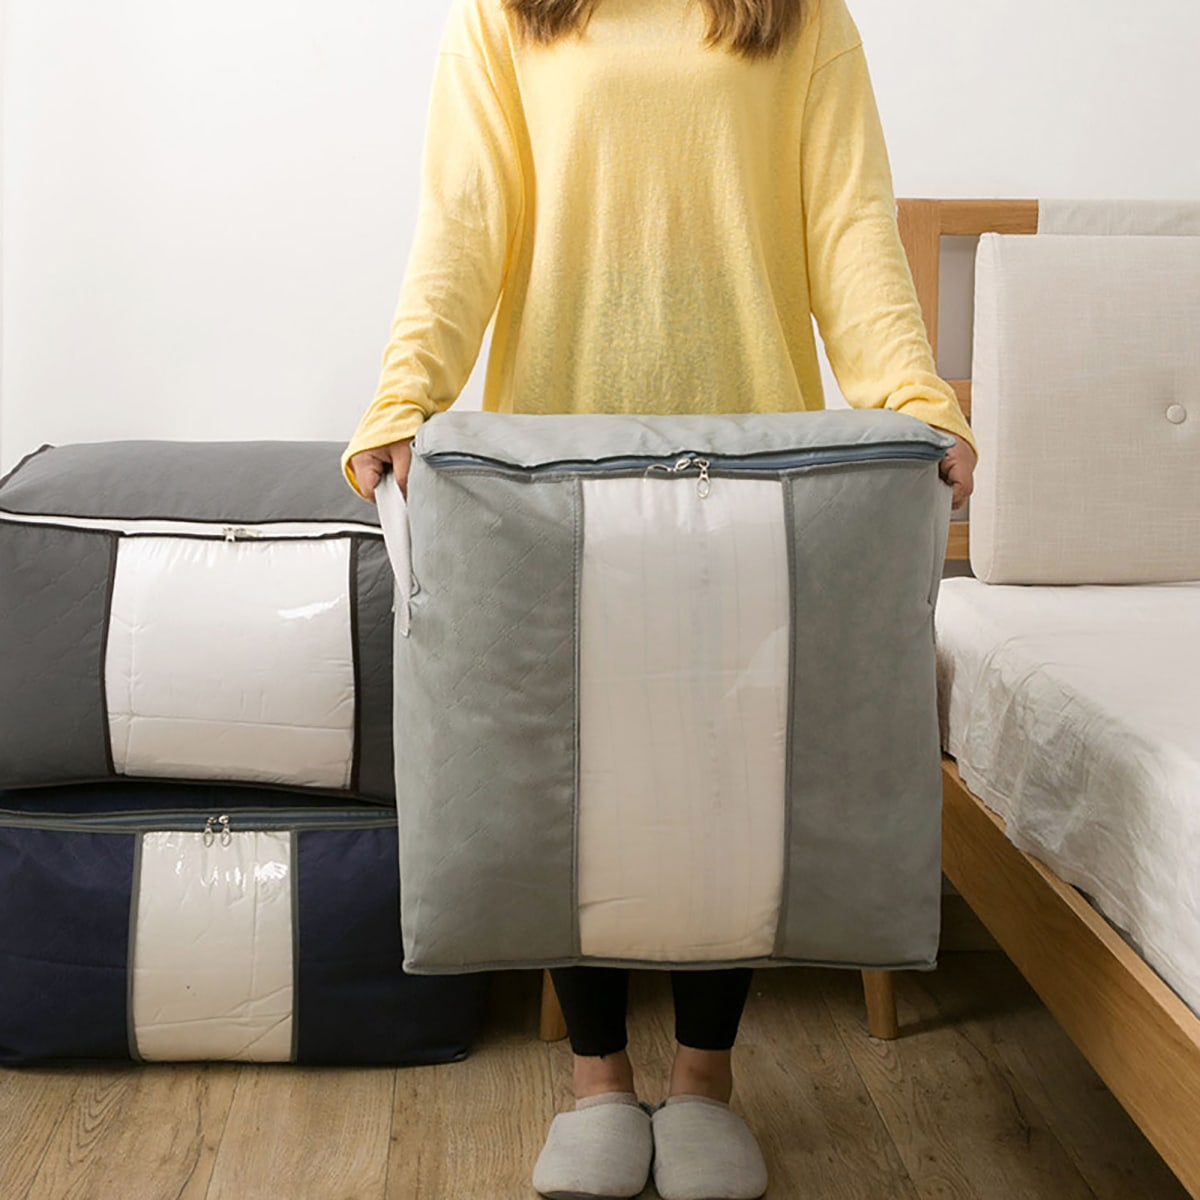 1pc grote kleding opbergtas